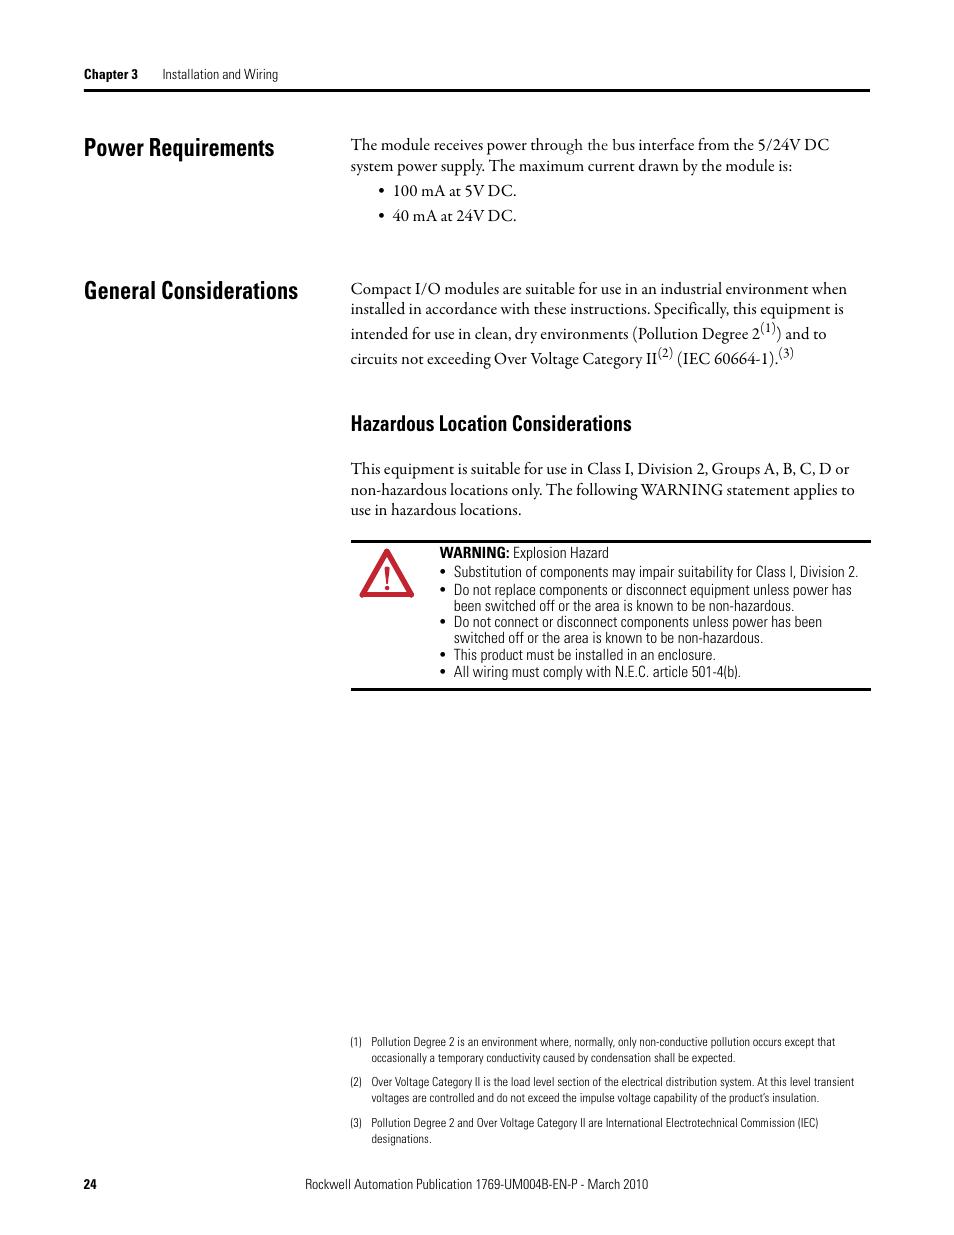 Power requirements, General considerations, Hazardous